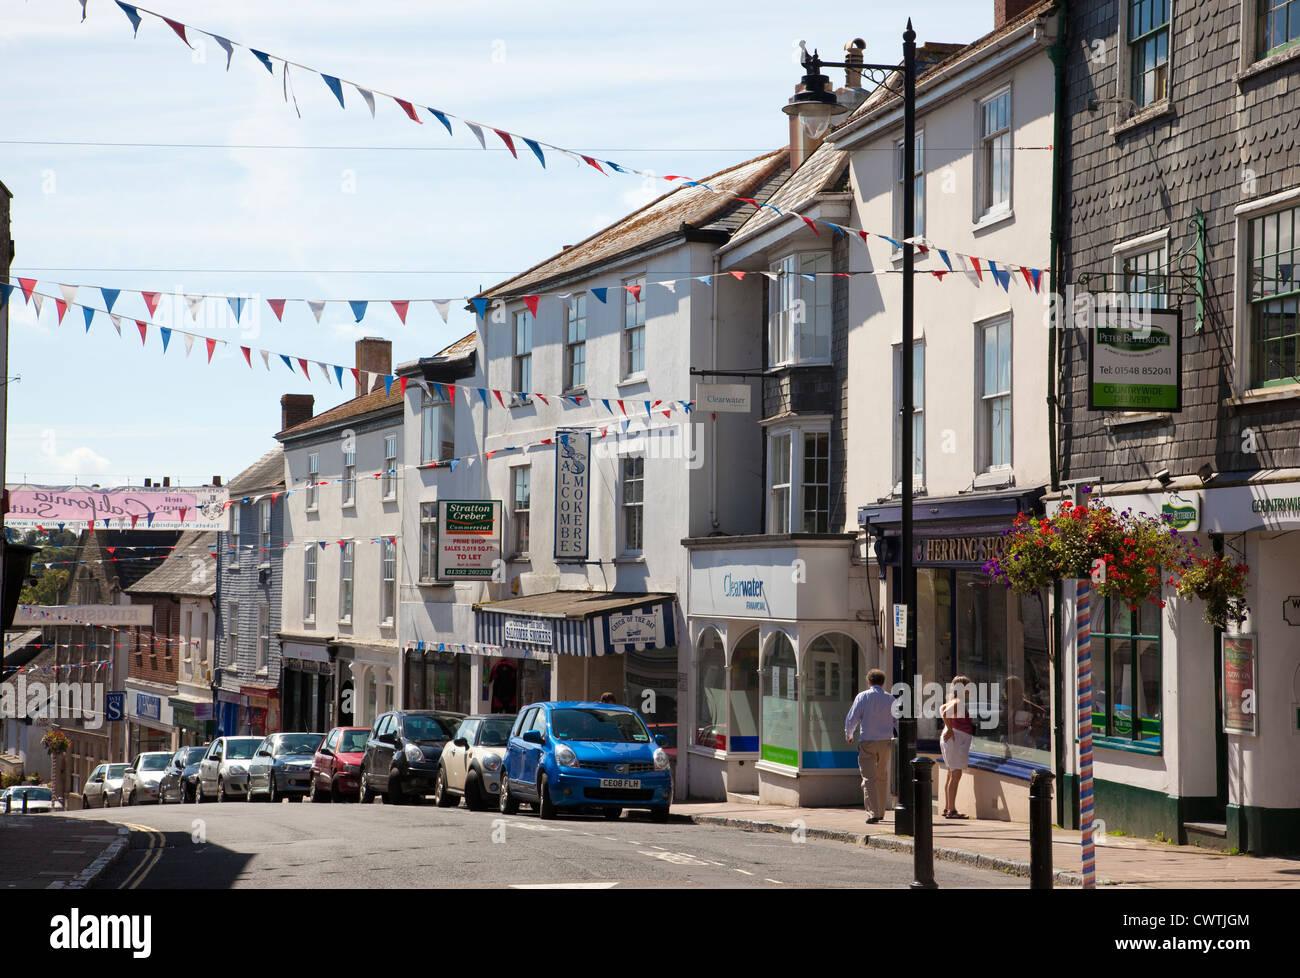 Kingsbridge, Fore Street, South Devon, England, United Kingdom - Stock Image